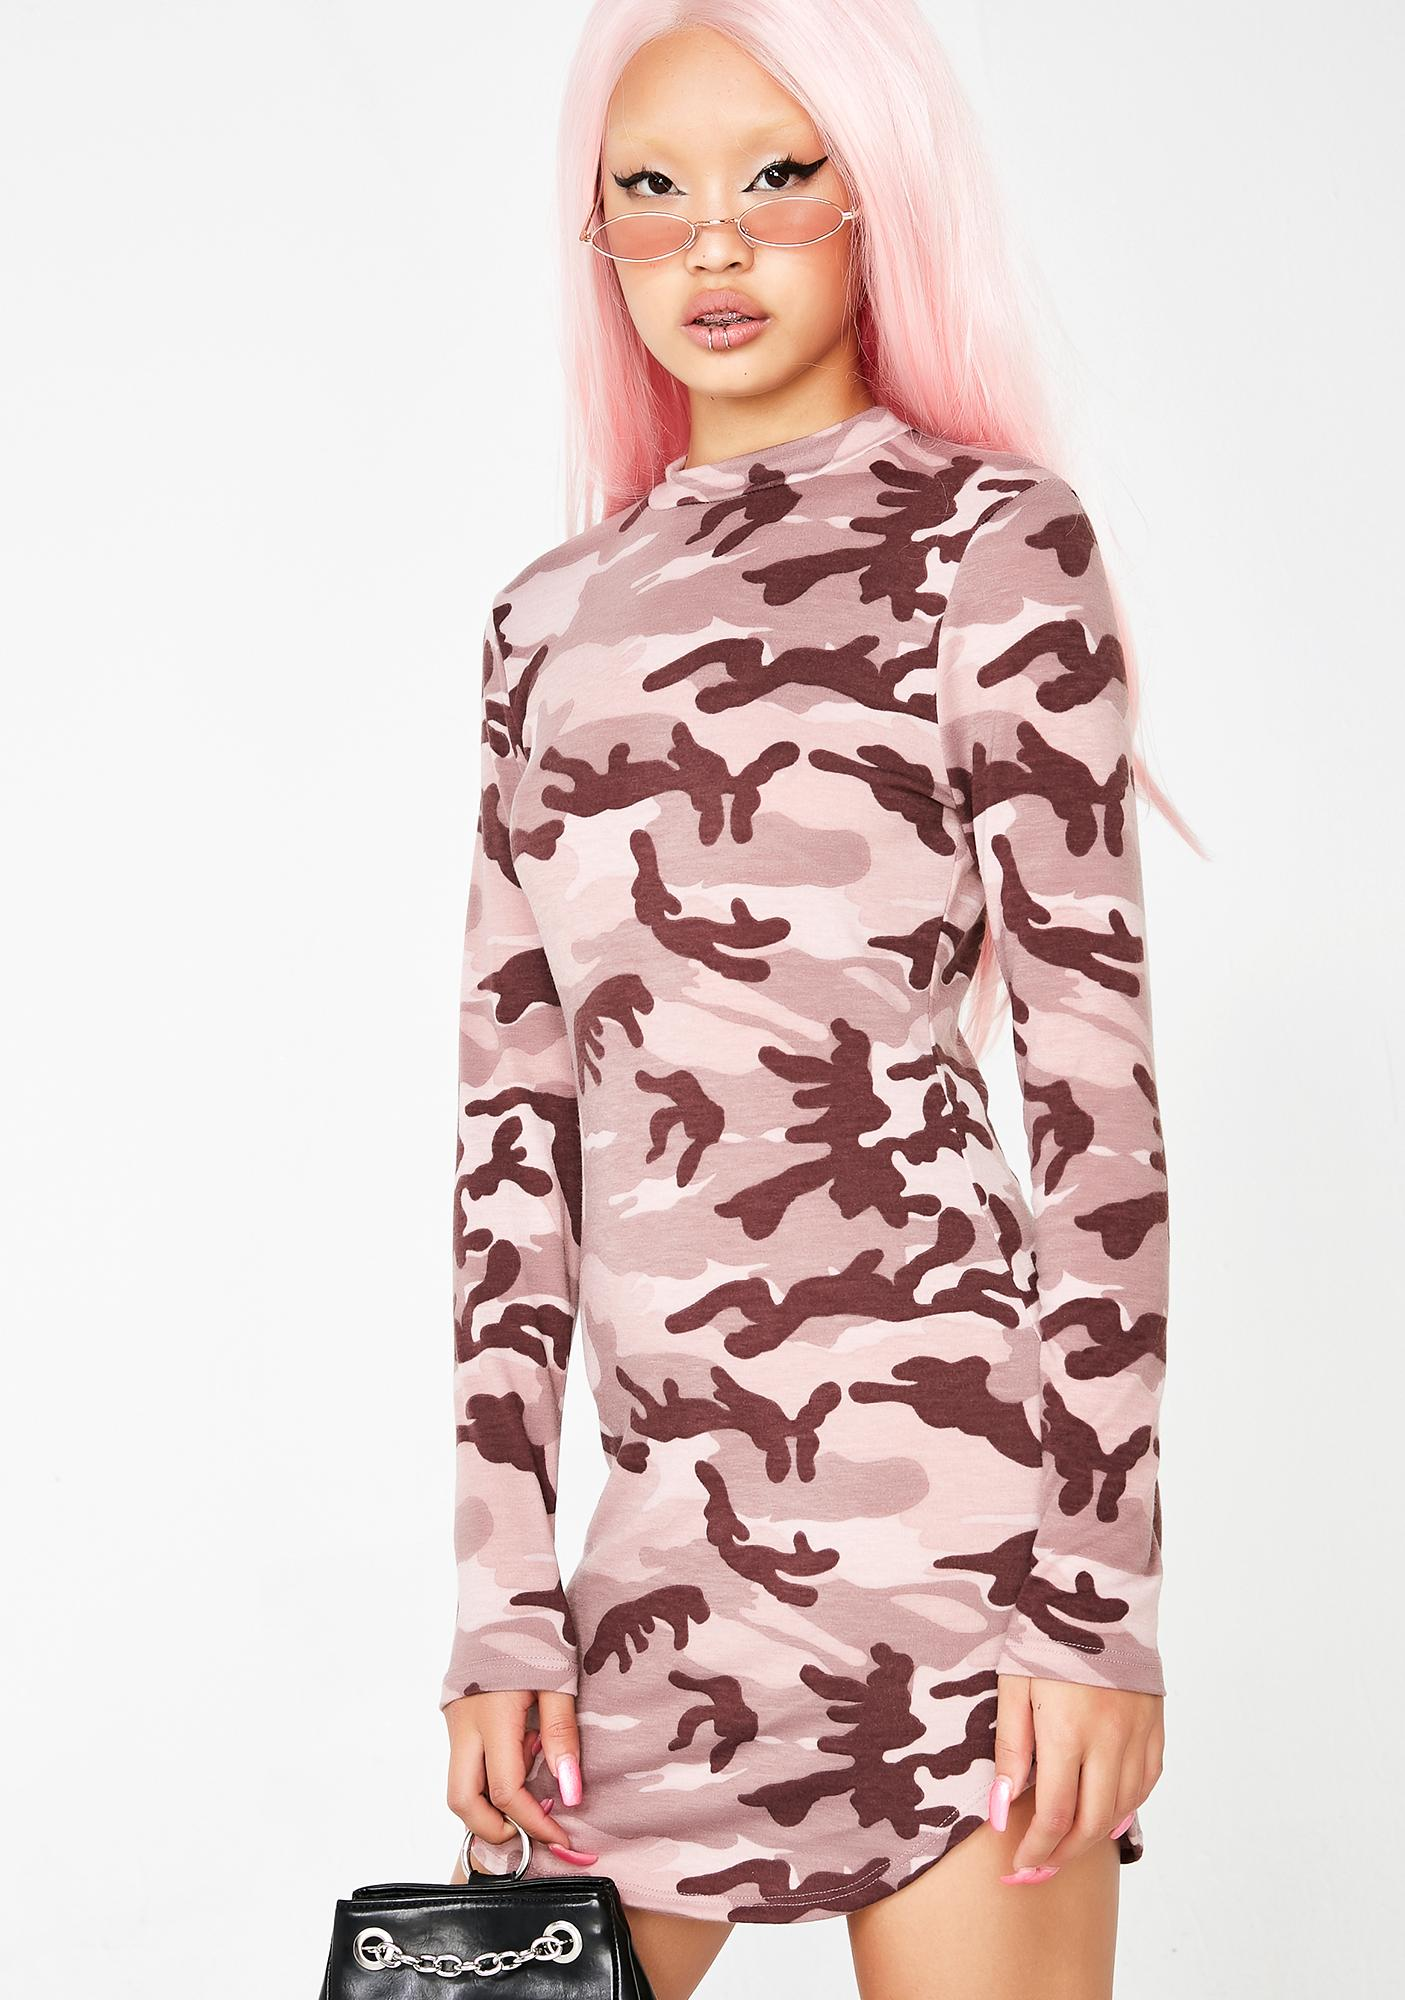 Breezy Camo Dress